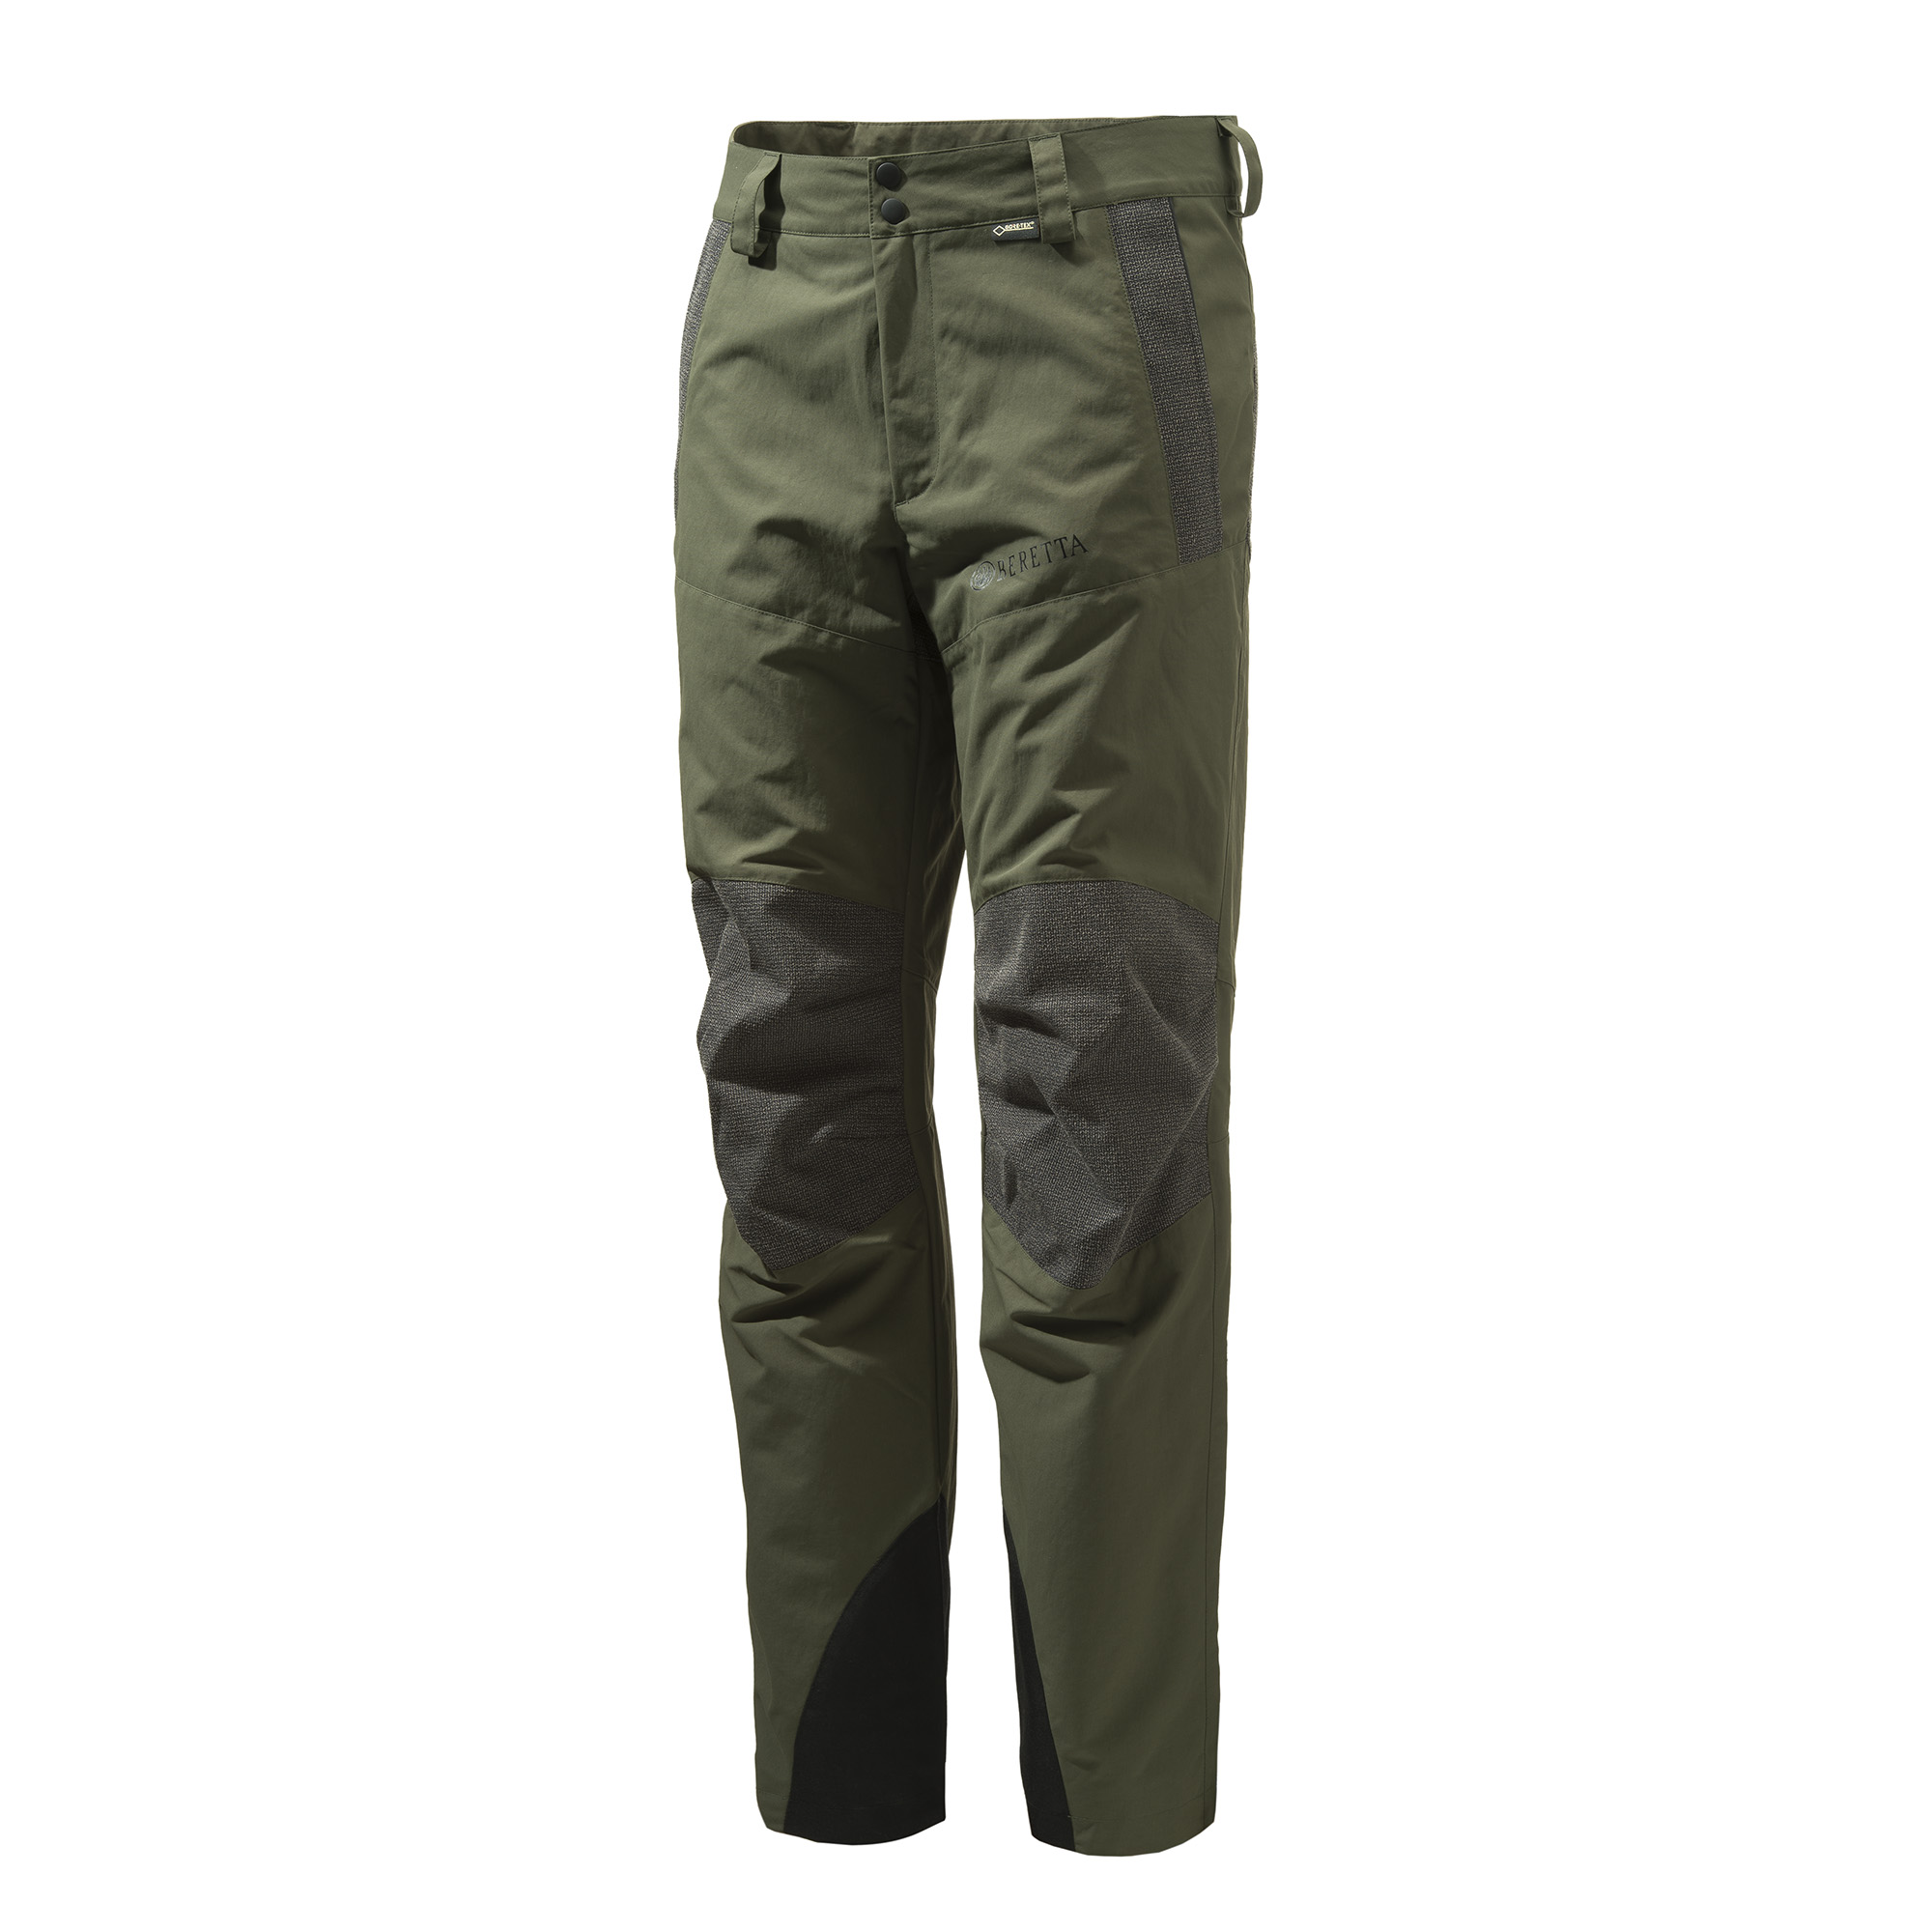 Beretta Thorn Resistant Pants GTX